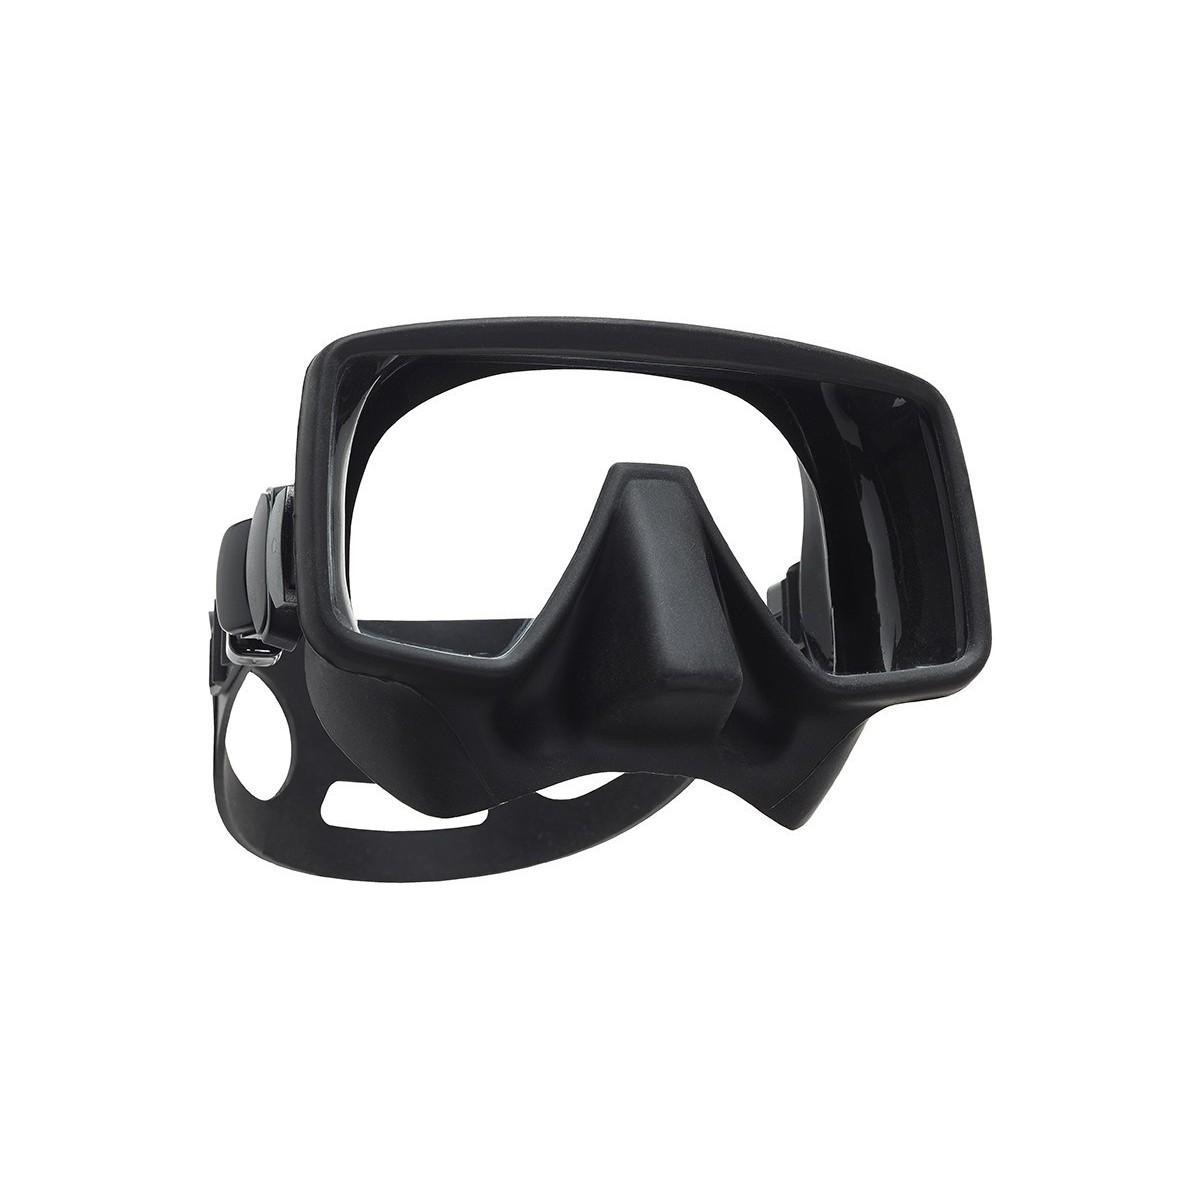 Scubapro Frameless Gorilla Scuba Diving Mask